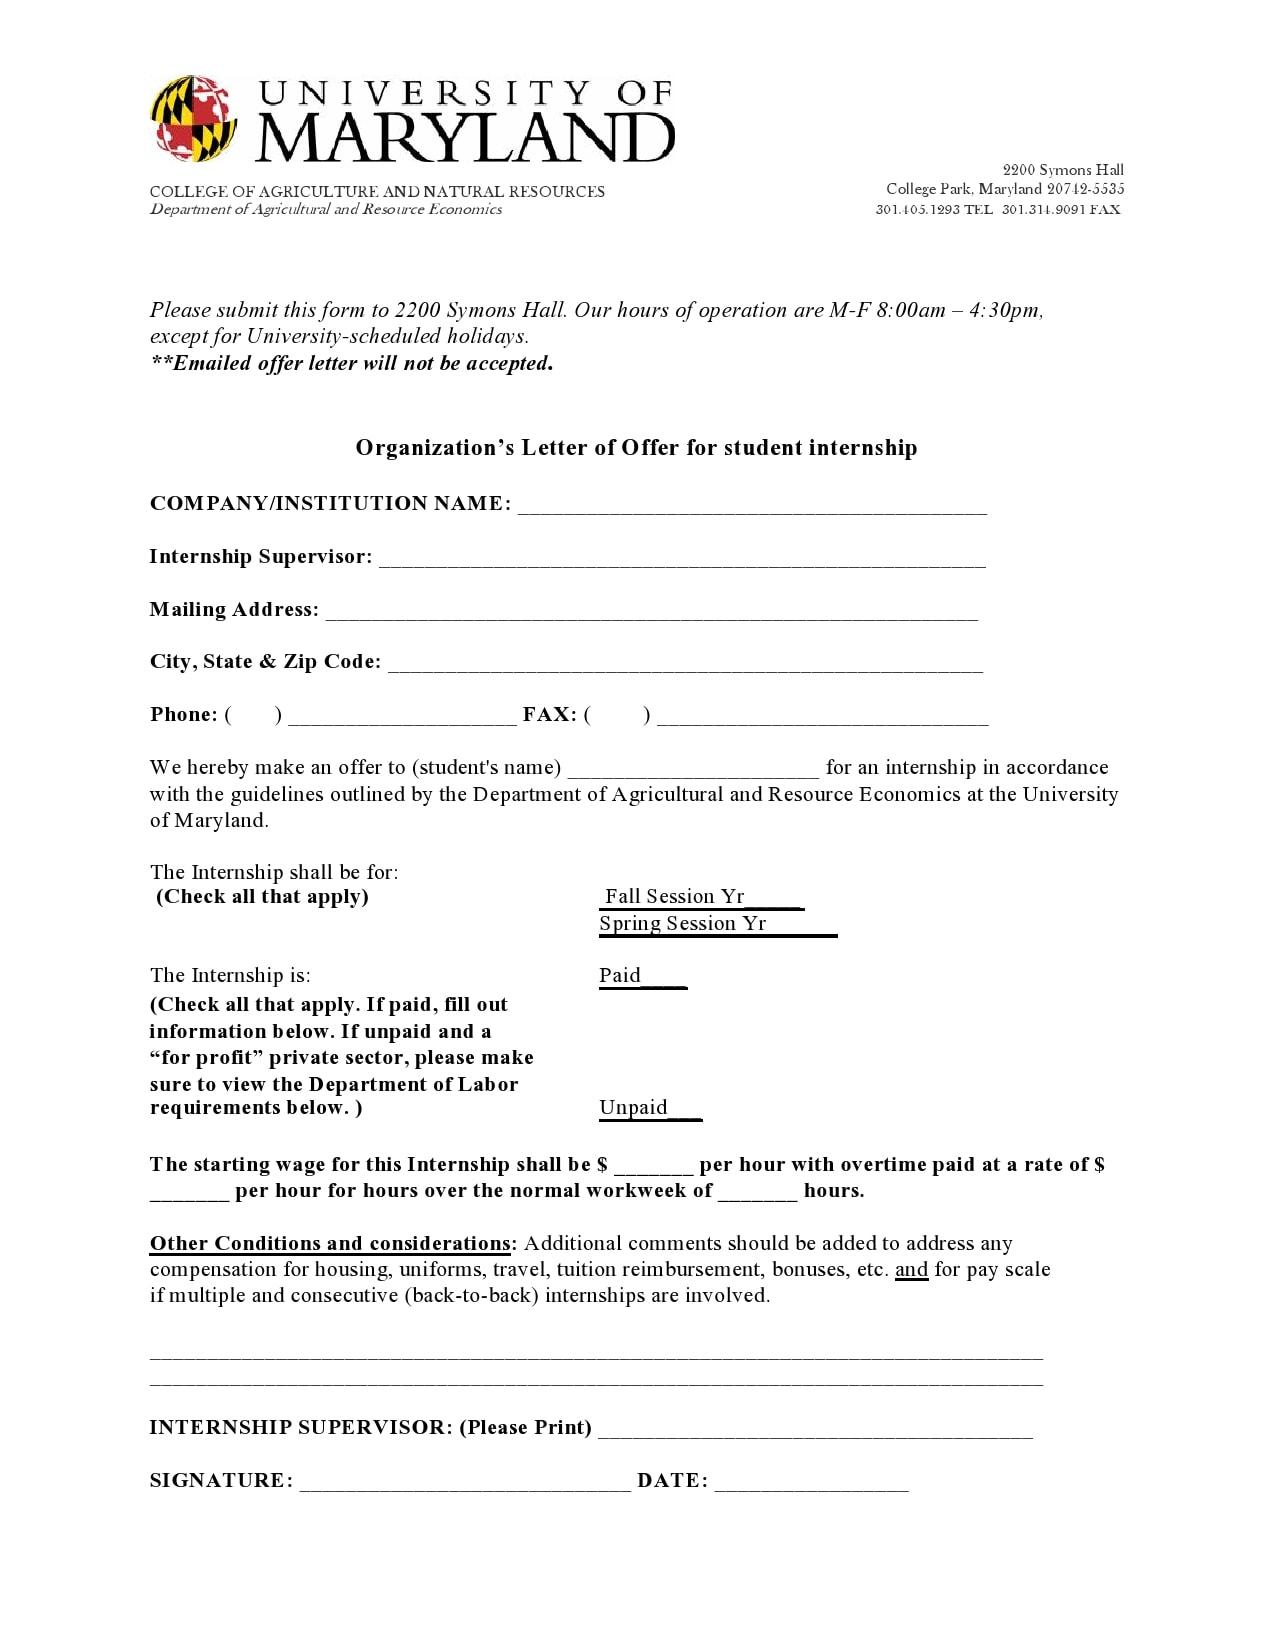 internship offer letter 26